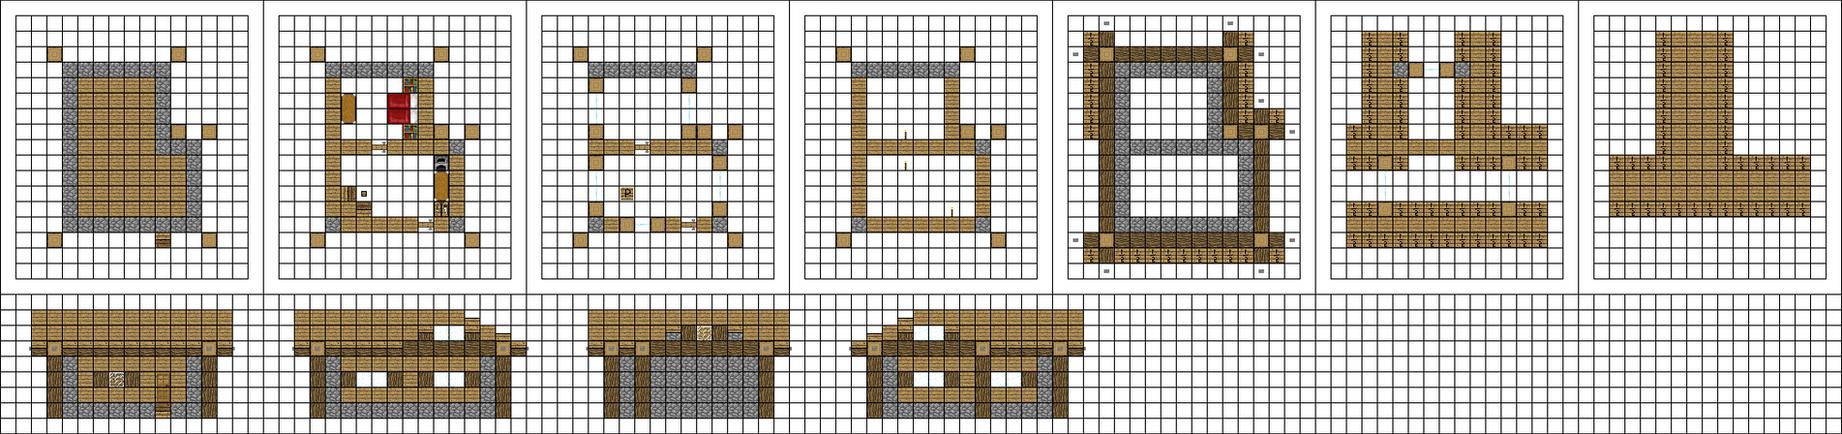 Alternate Large House by MysticSamuraiX